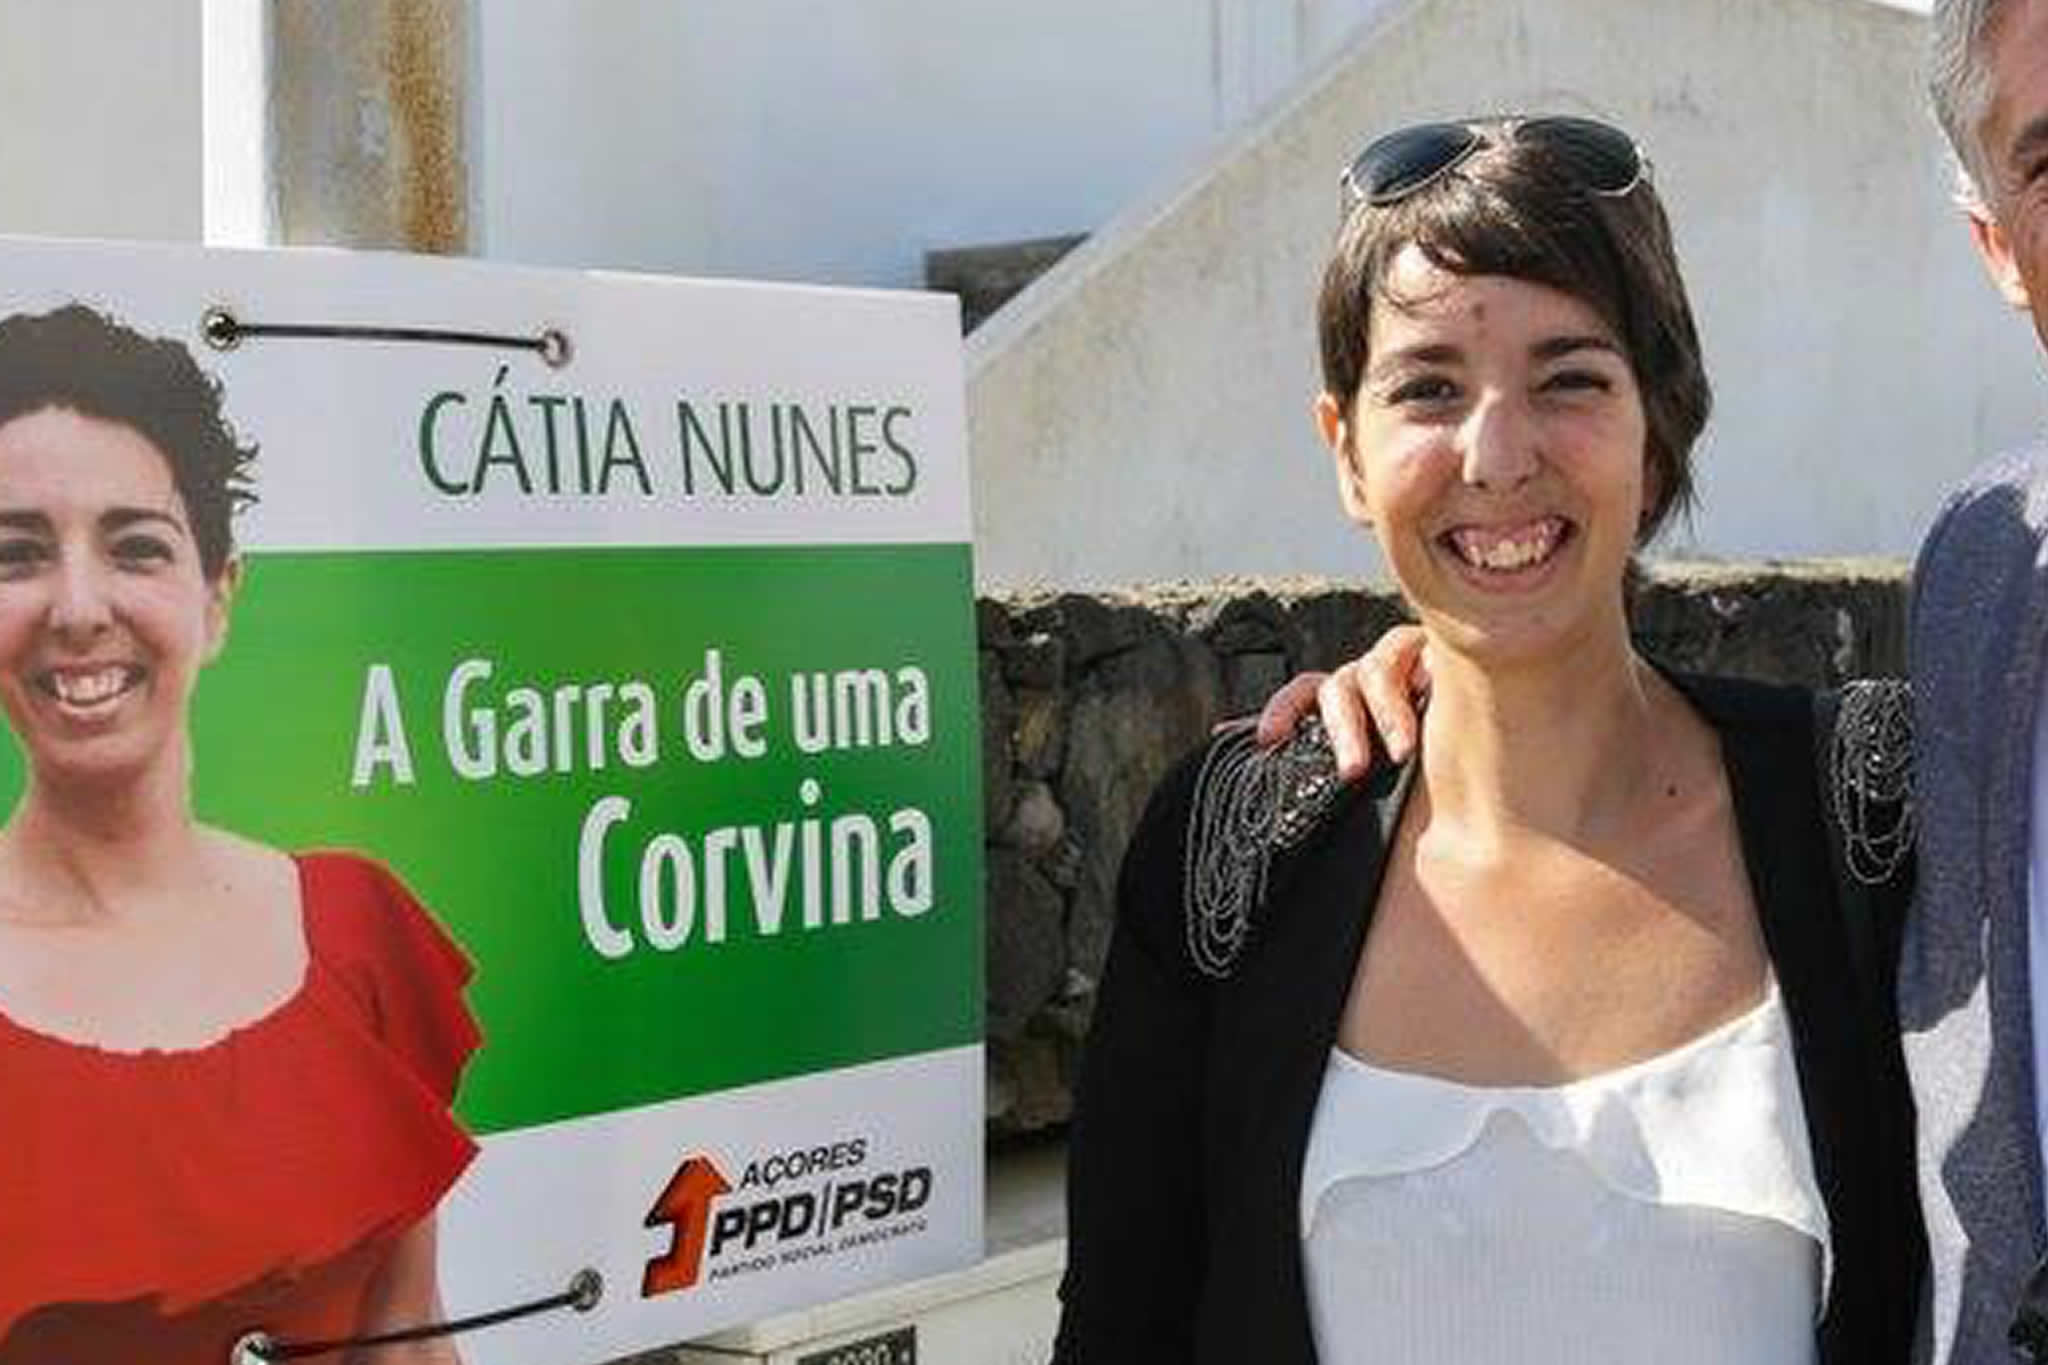 Catia Nunes